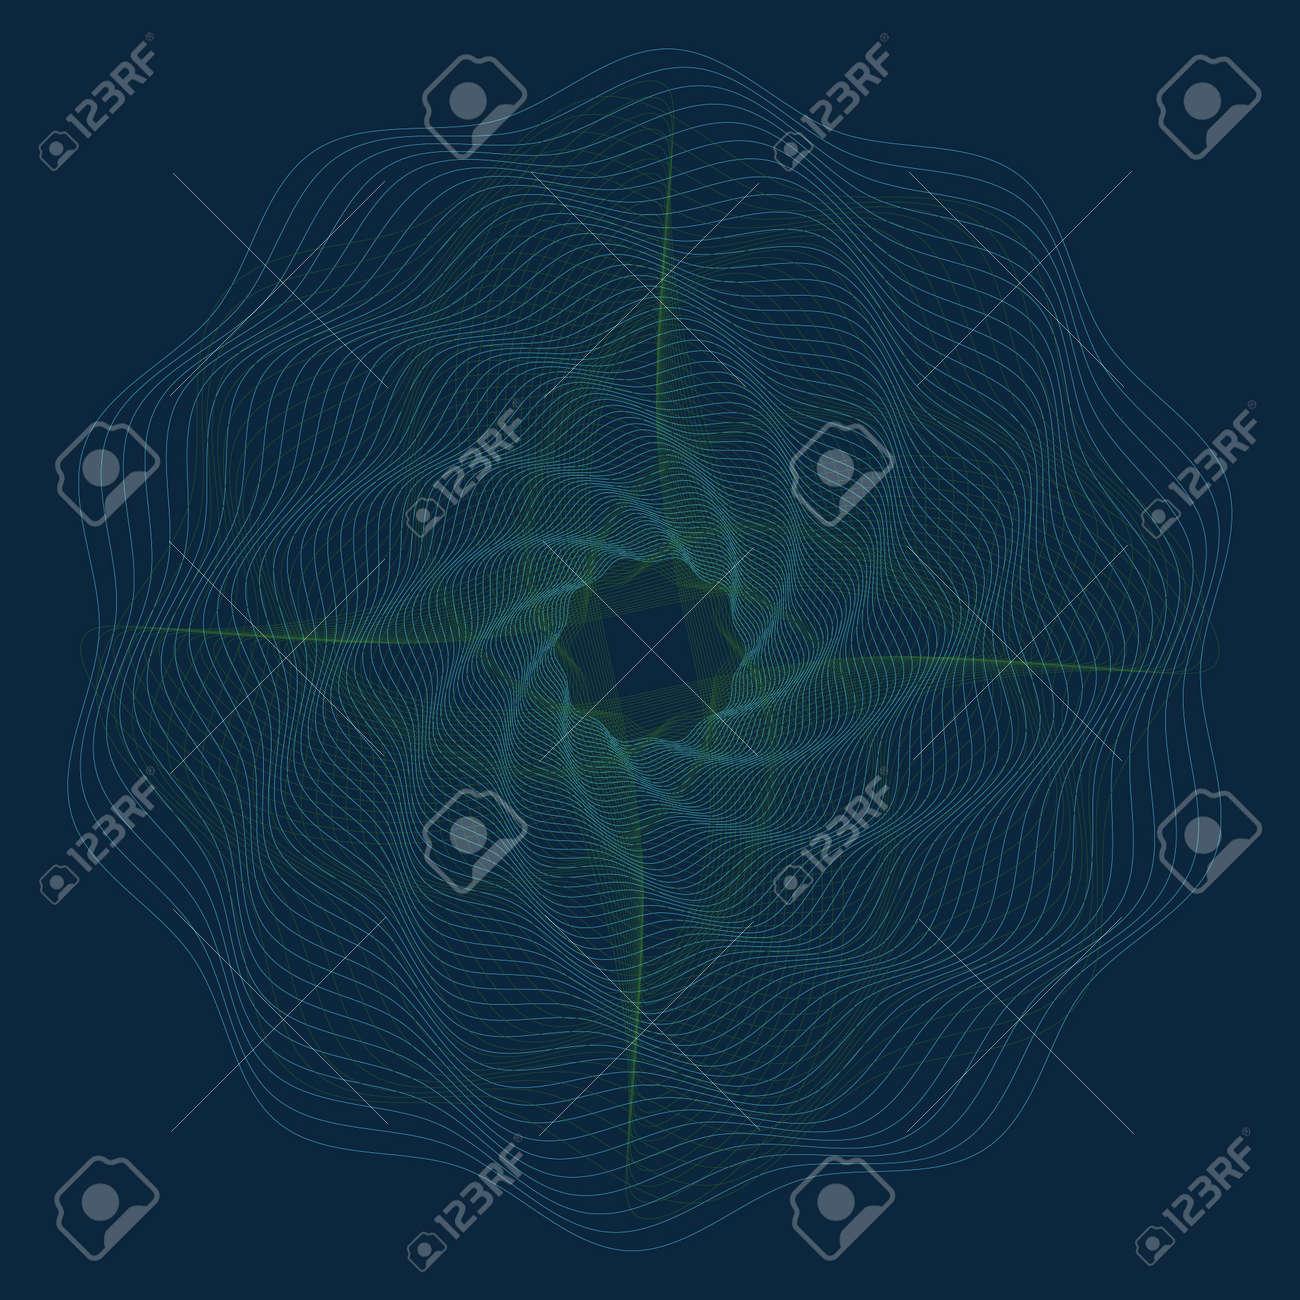 Editable guilloche vector pattern - 123438383